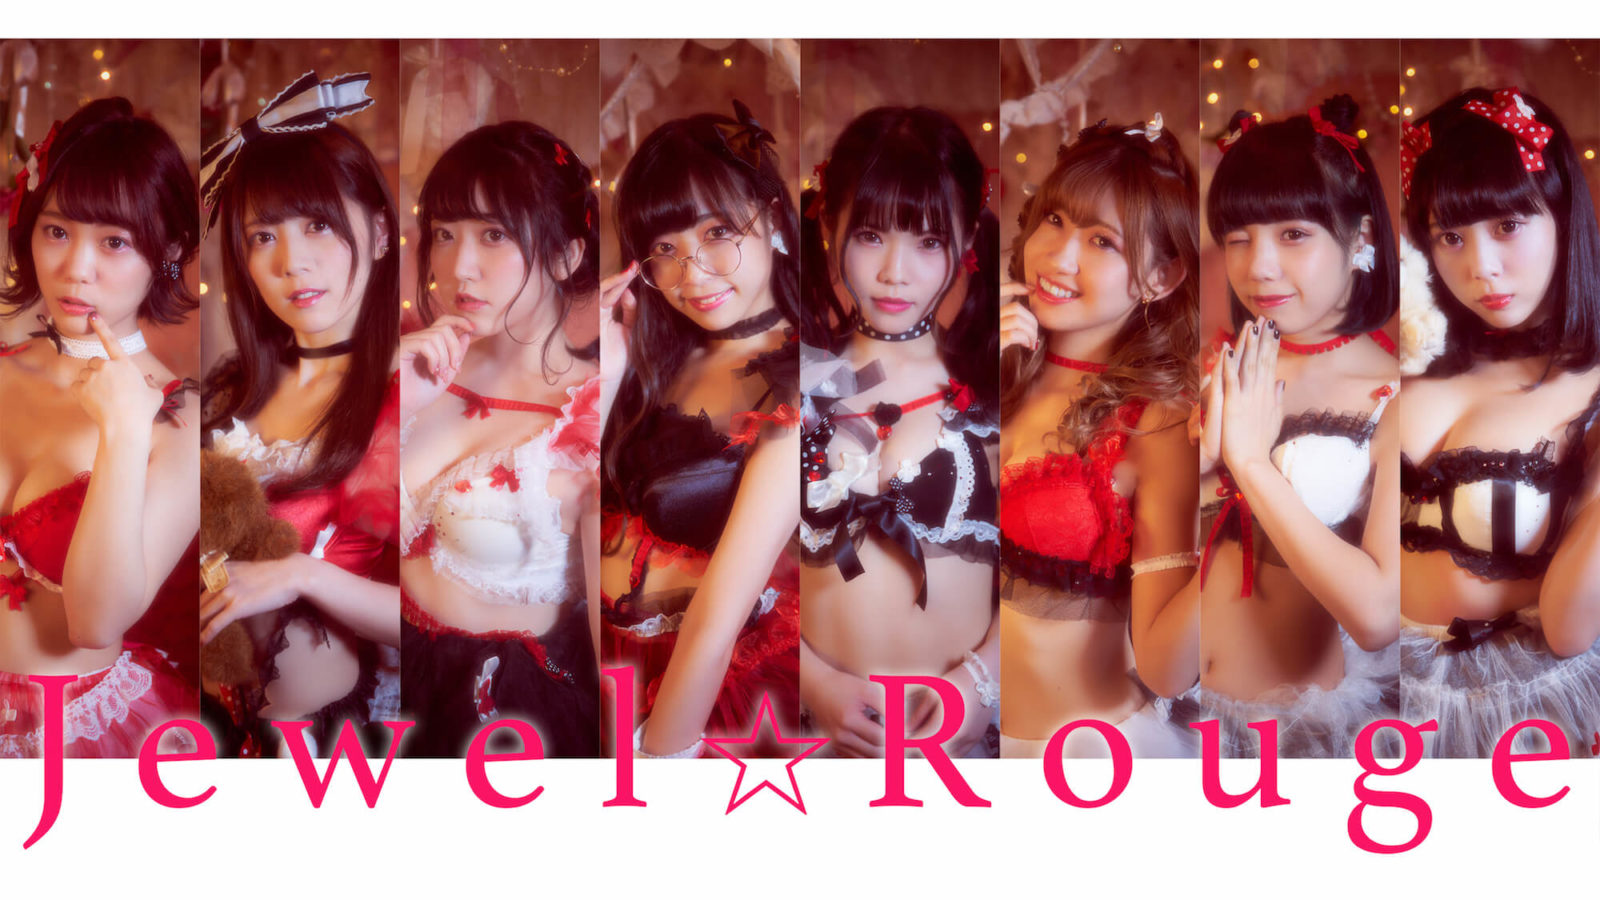 Jewel☆Rouge「Jewel☆Rougeを知ってもらうきっかけになれば」【「IDOL CONTENT EXPO ~大無銭祭~」出演グループインタビュー】サムネイル画像